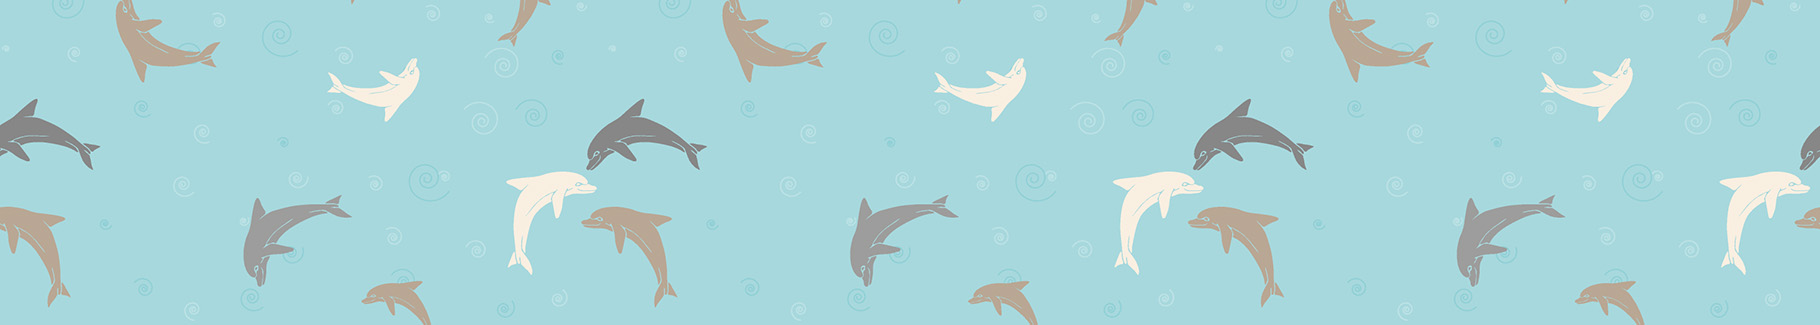 Tapeta vintage z motywem delfinów